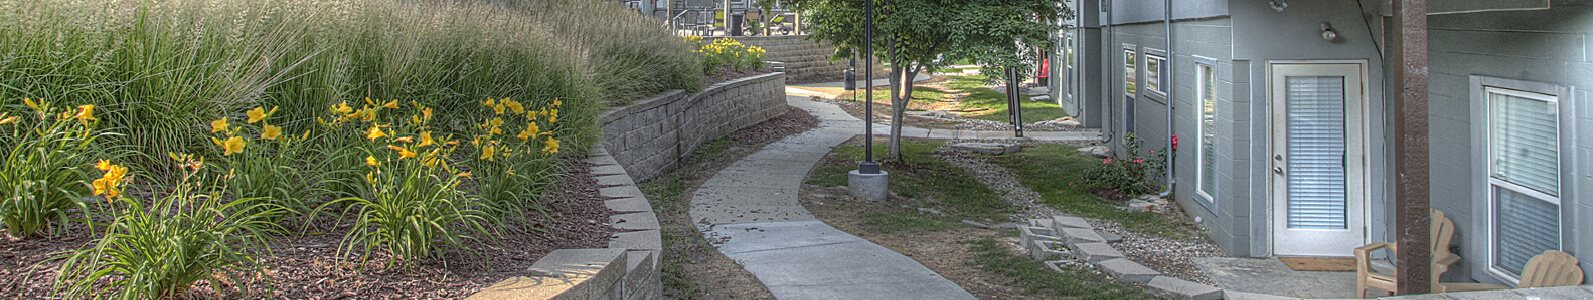 Meandering Pathway at Briar Hills, Omaha, NE 68118